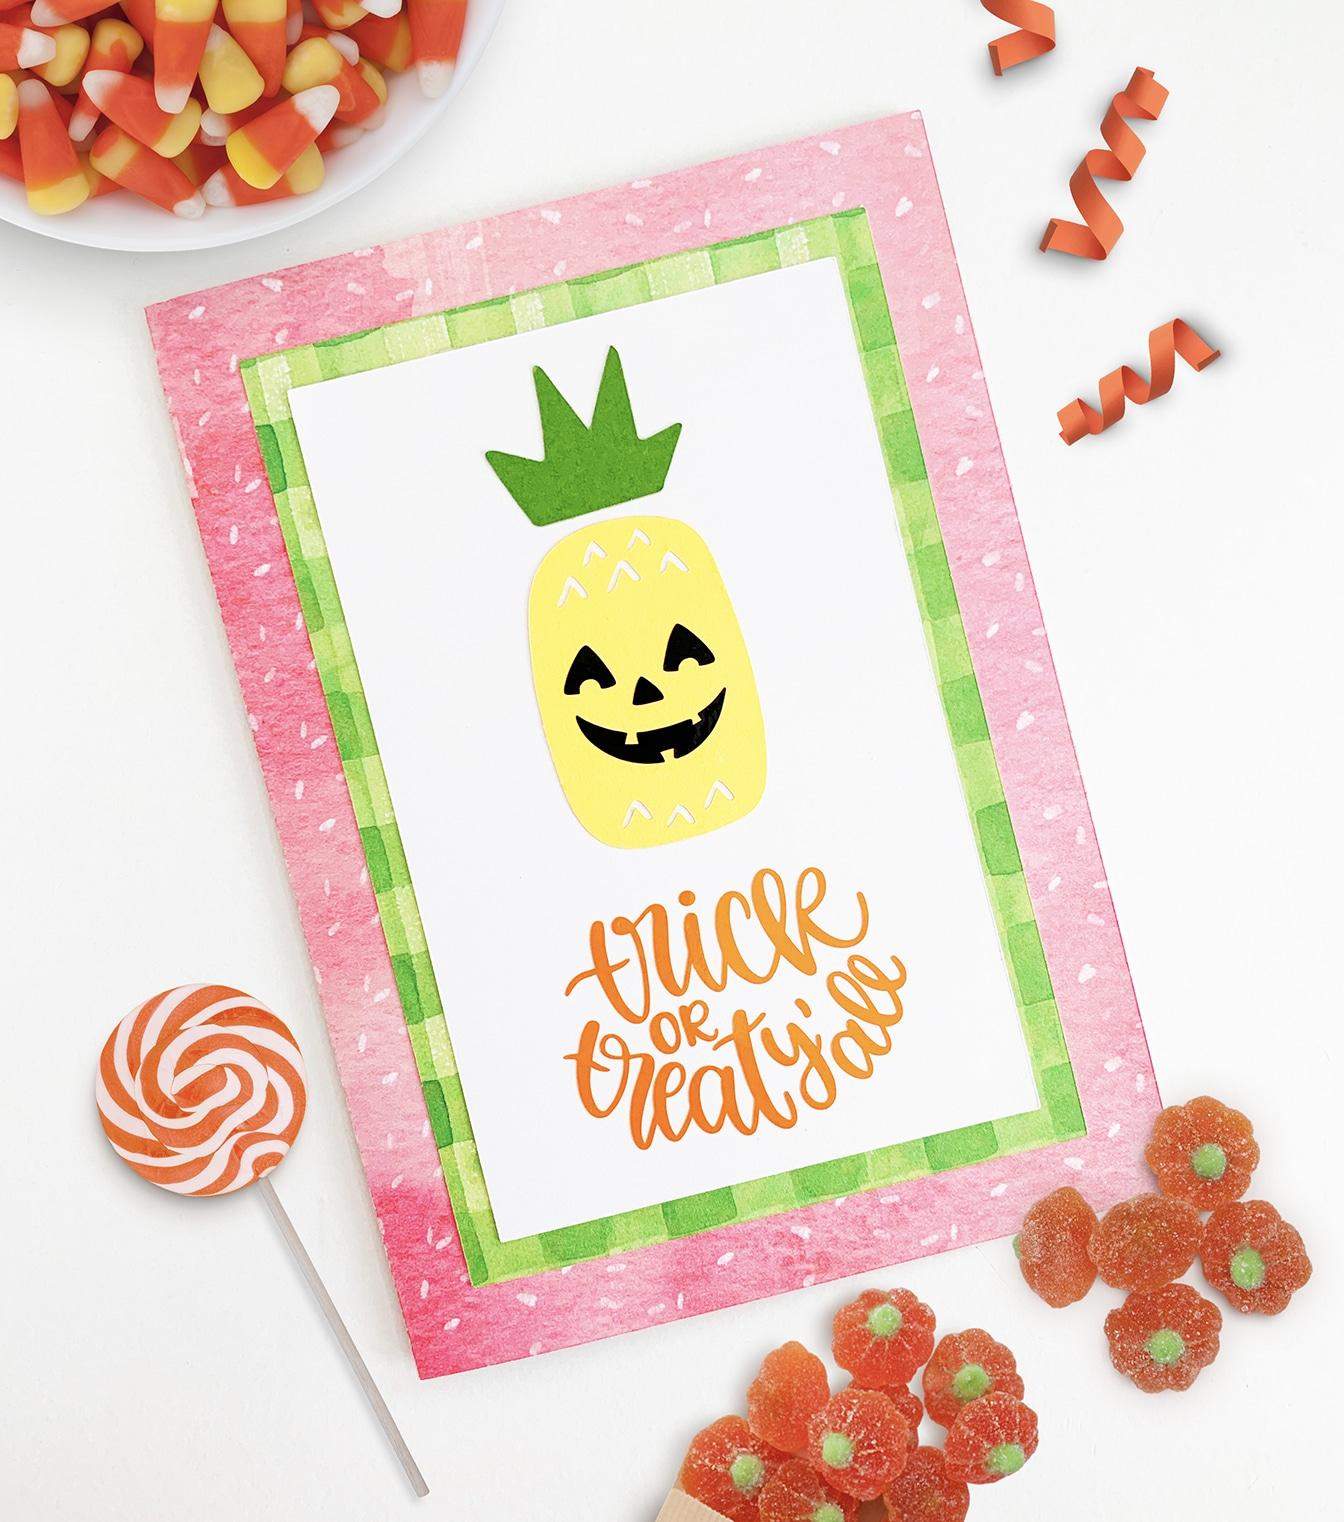 diy halloween greeting cards  handmade cards  pineapple